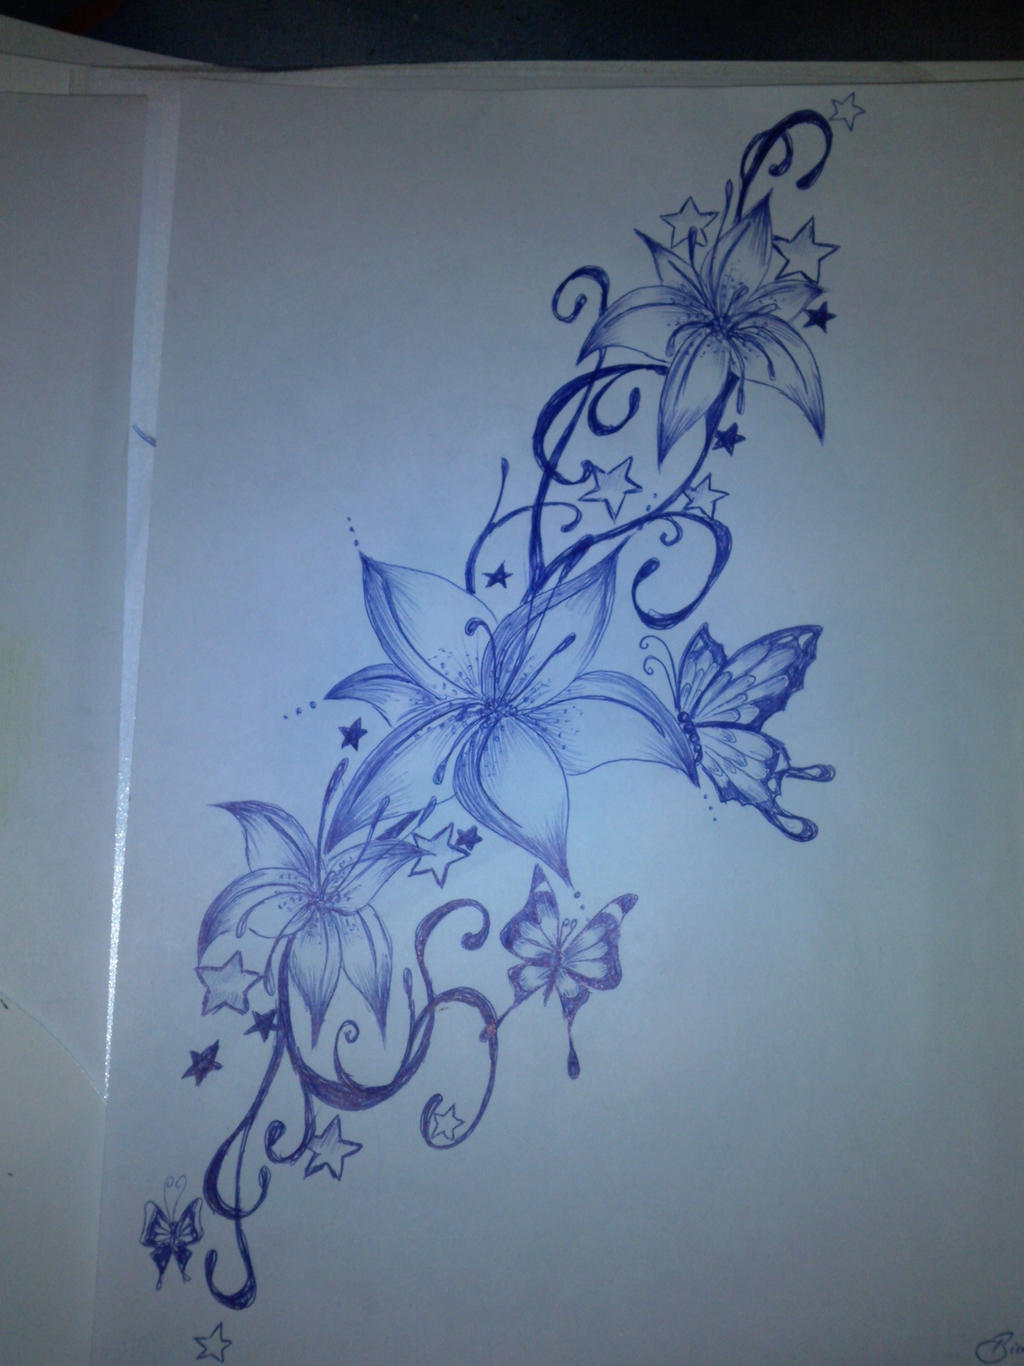 Lotus flower tattoo designs free image collections flower wallpaper hd lotus flower tattoo designs free gallery flower wallpaper hd lotus flower tattoo designs free image collections izmirmasajfo